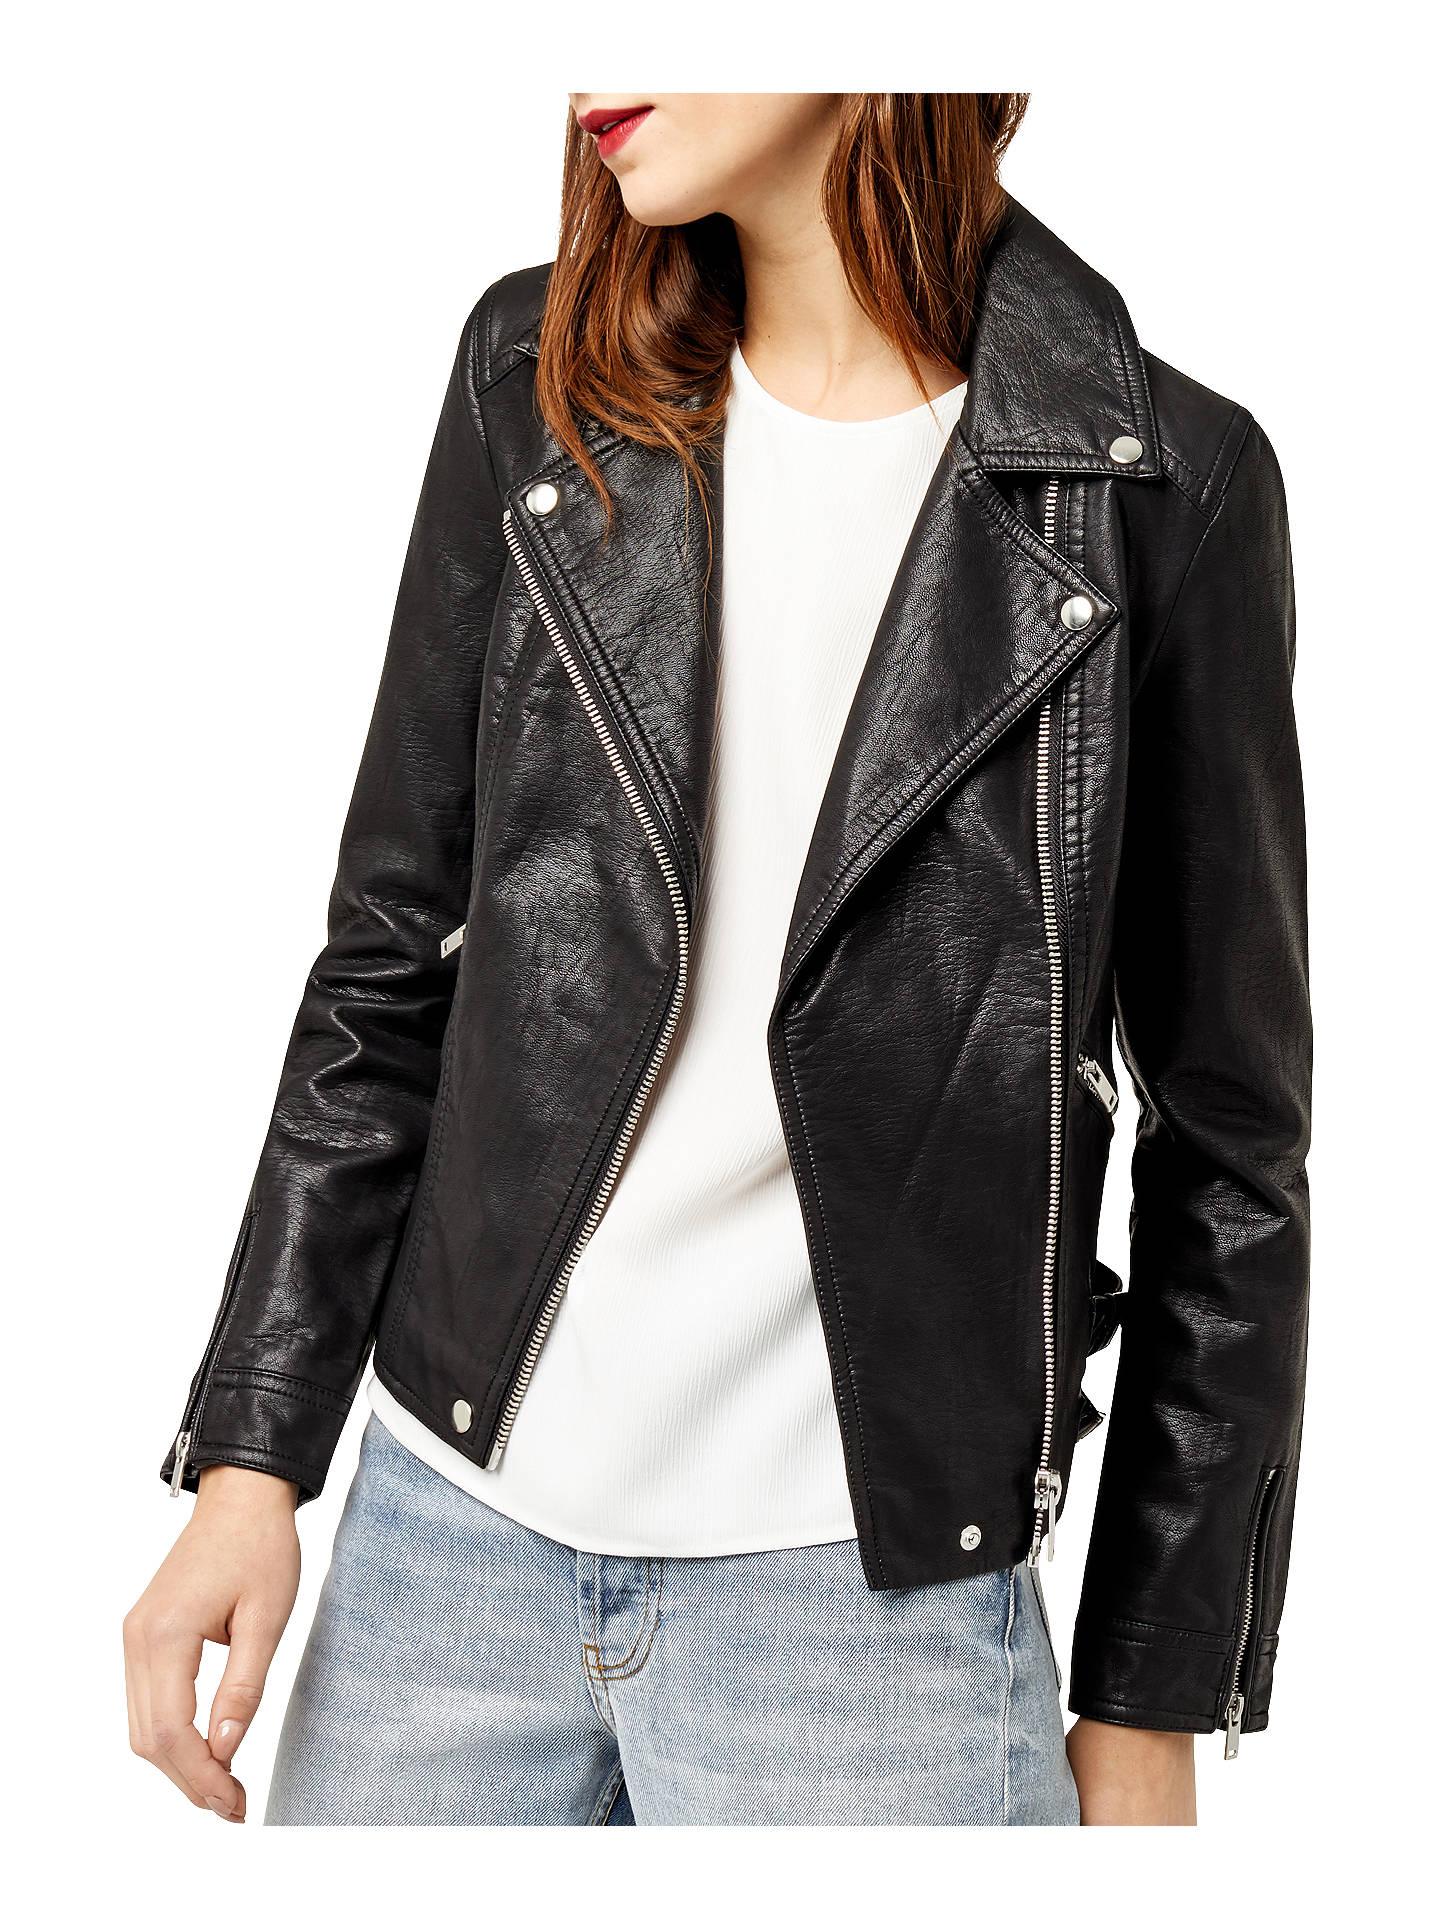 e8cd4364c Warehouse Faux Leather Biker Jacket, Black at John Lewis & Partners